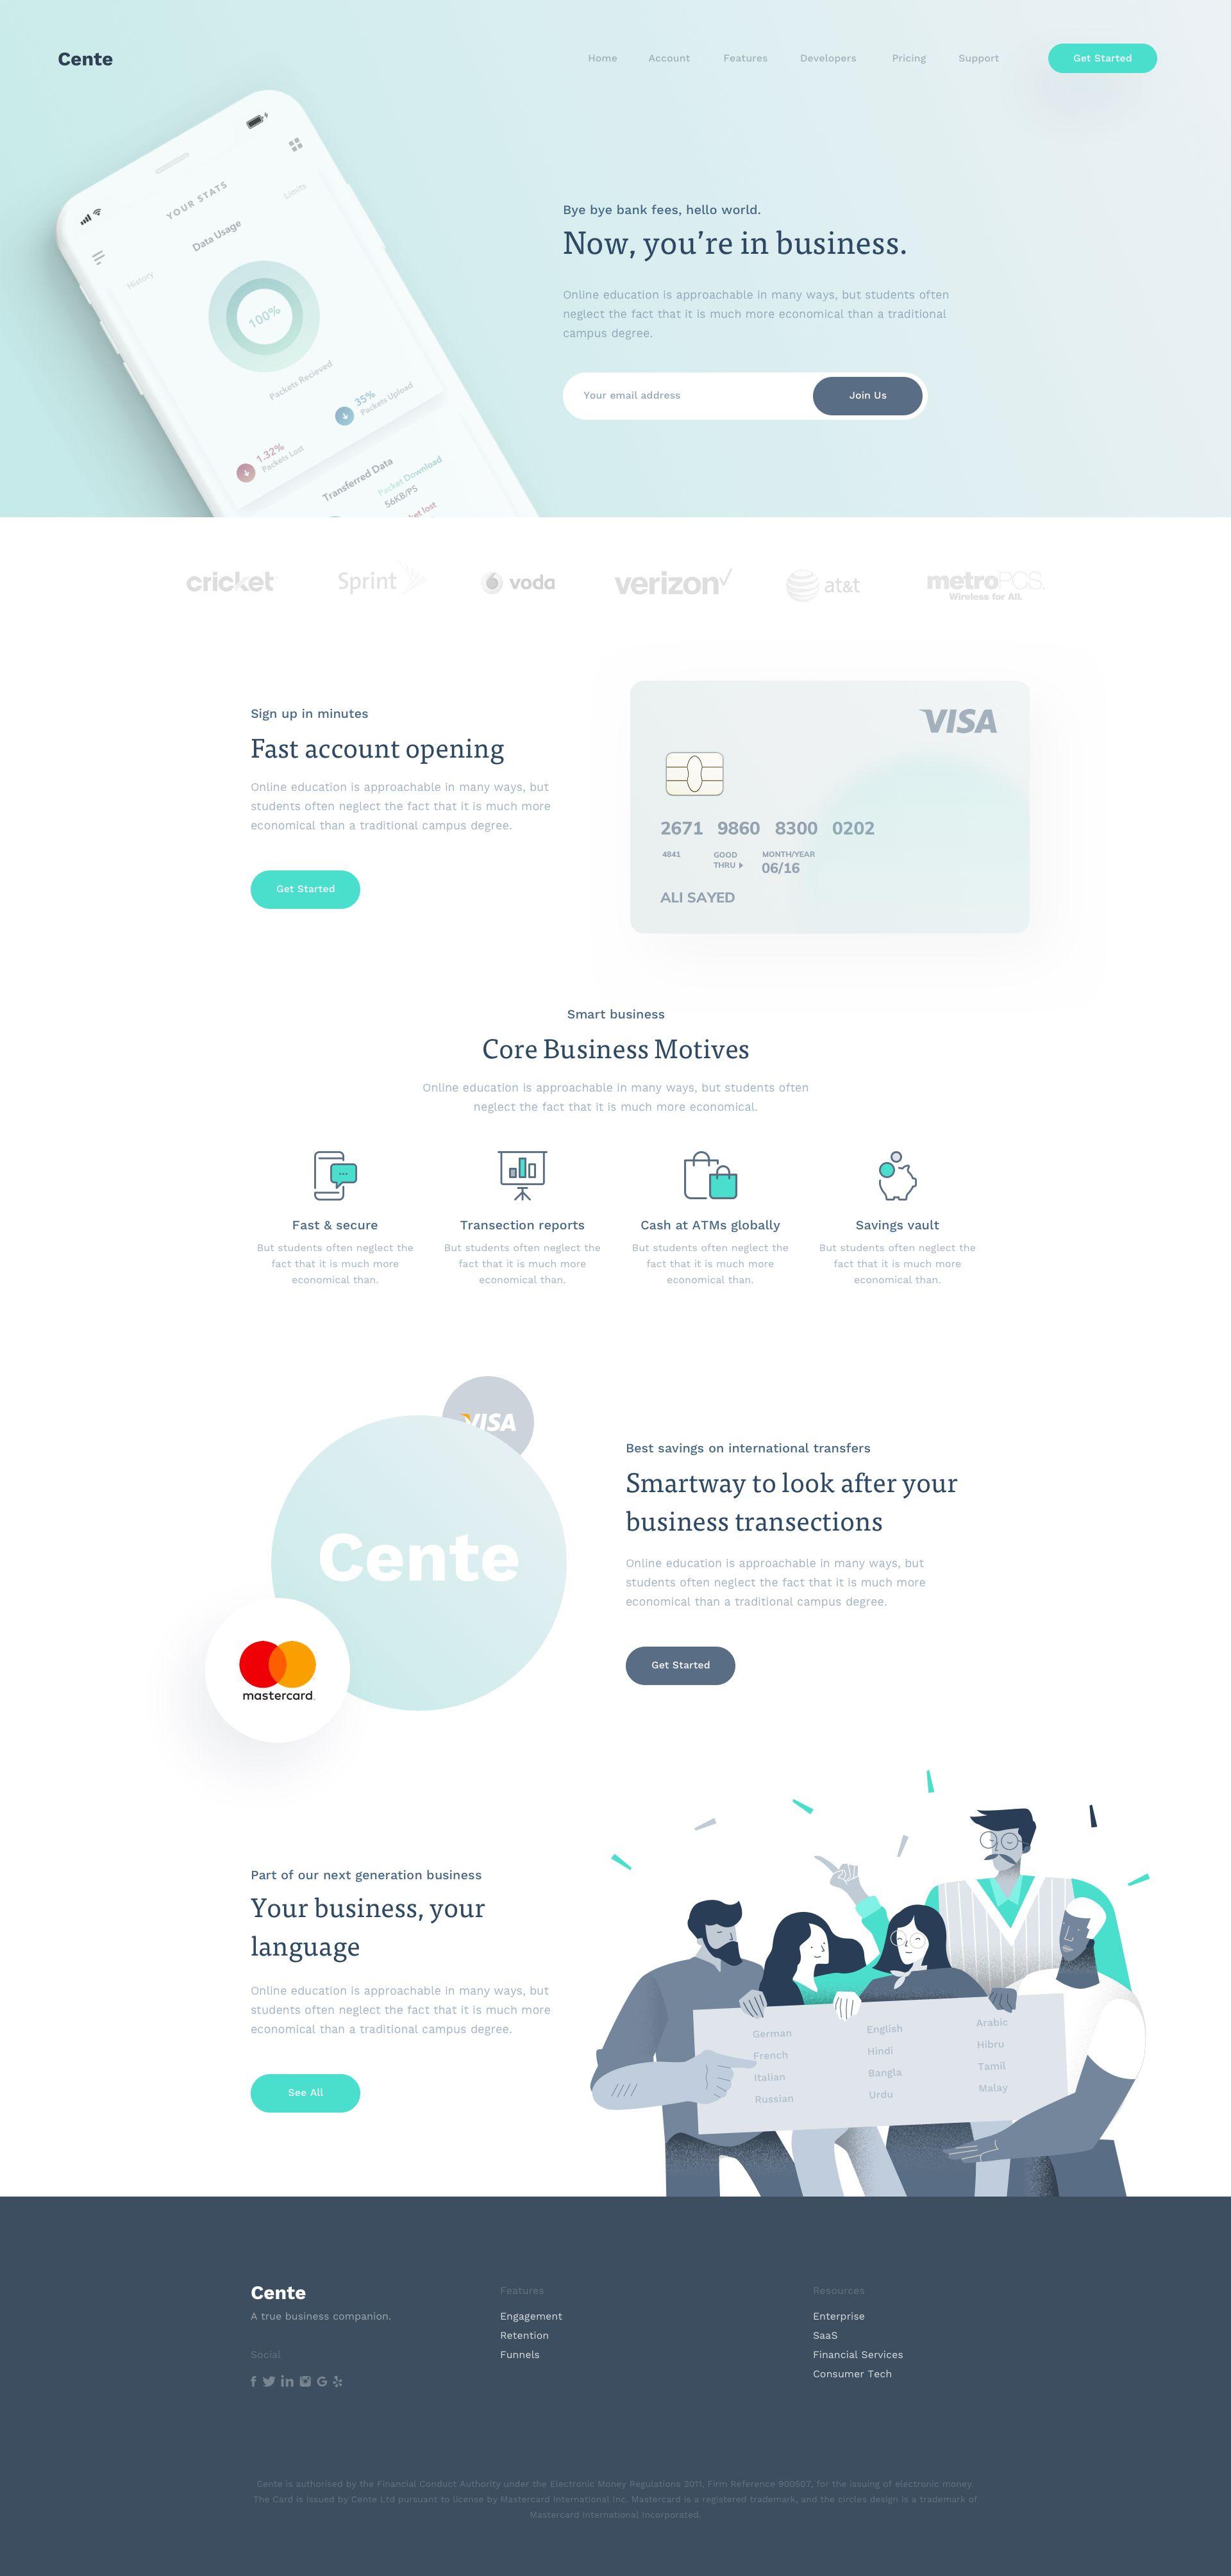 Cente Landing Page #landingpage #dribbble #ui #illustration #webdesign #app #website